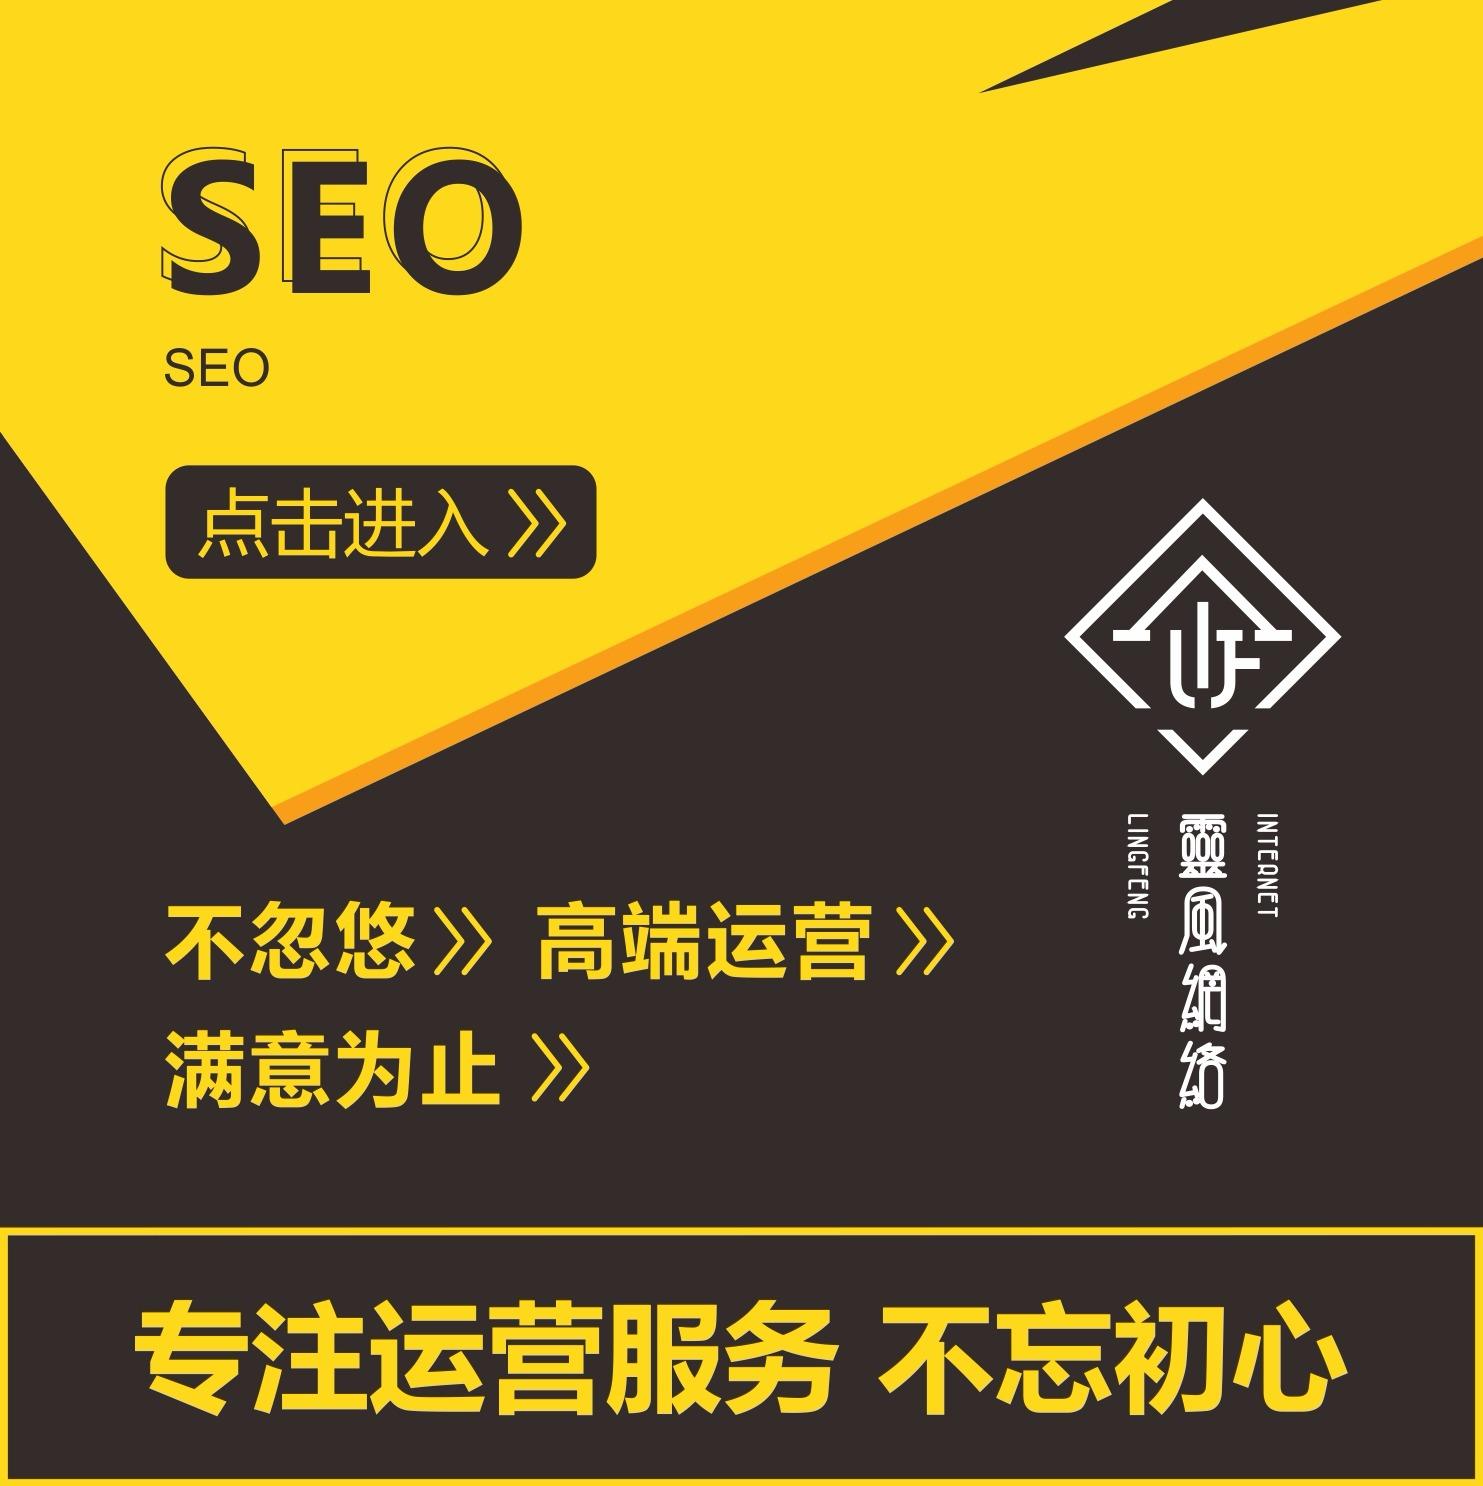 SEO企业官网站优化/搜素引擎权重优化/关键词排名seo优化